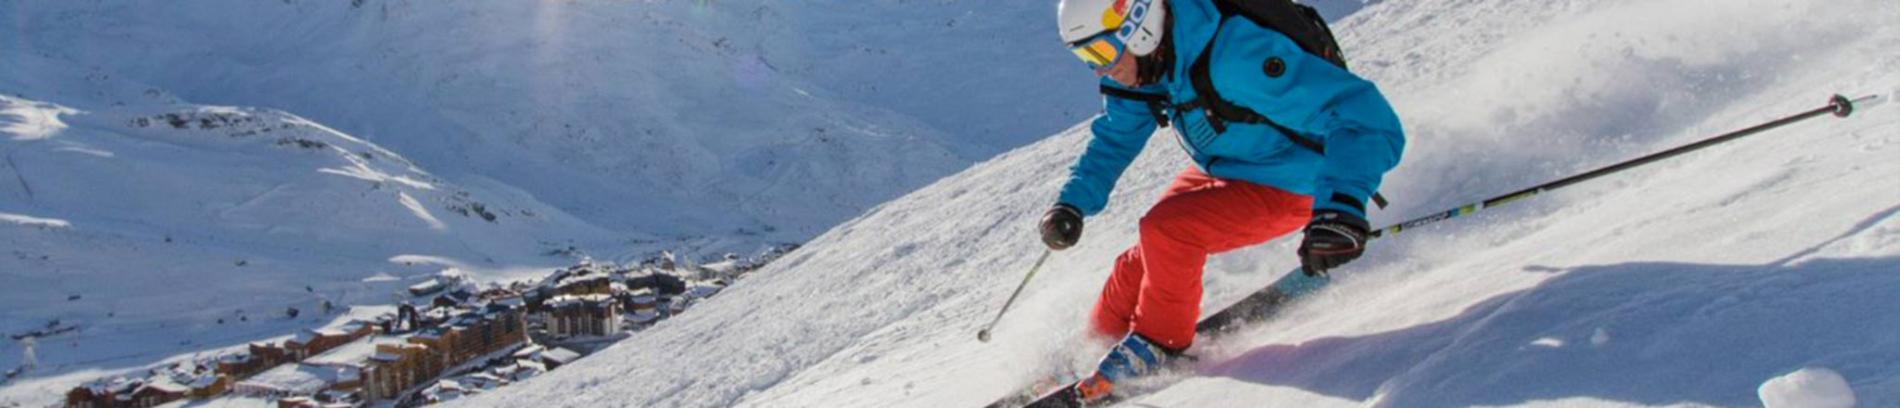 Slide le ski